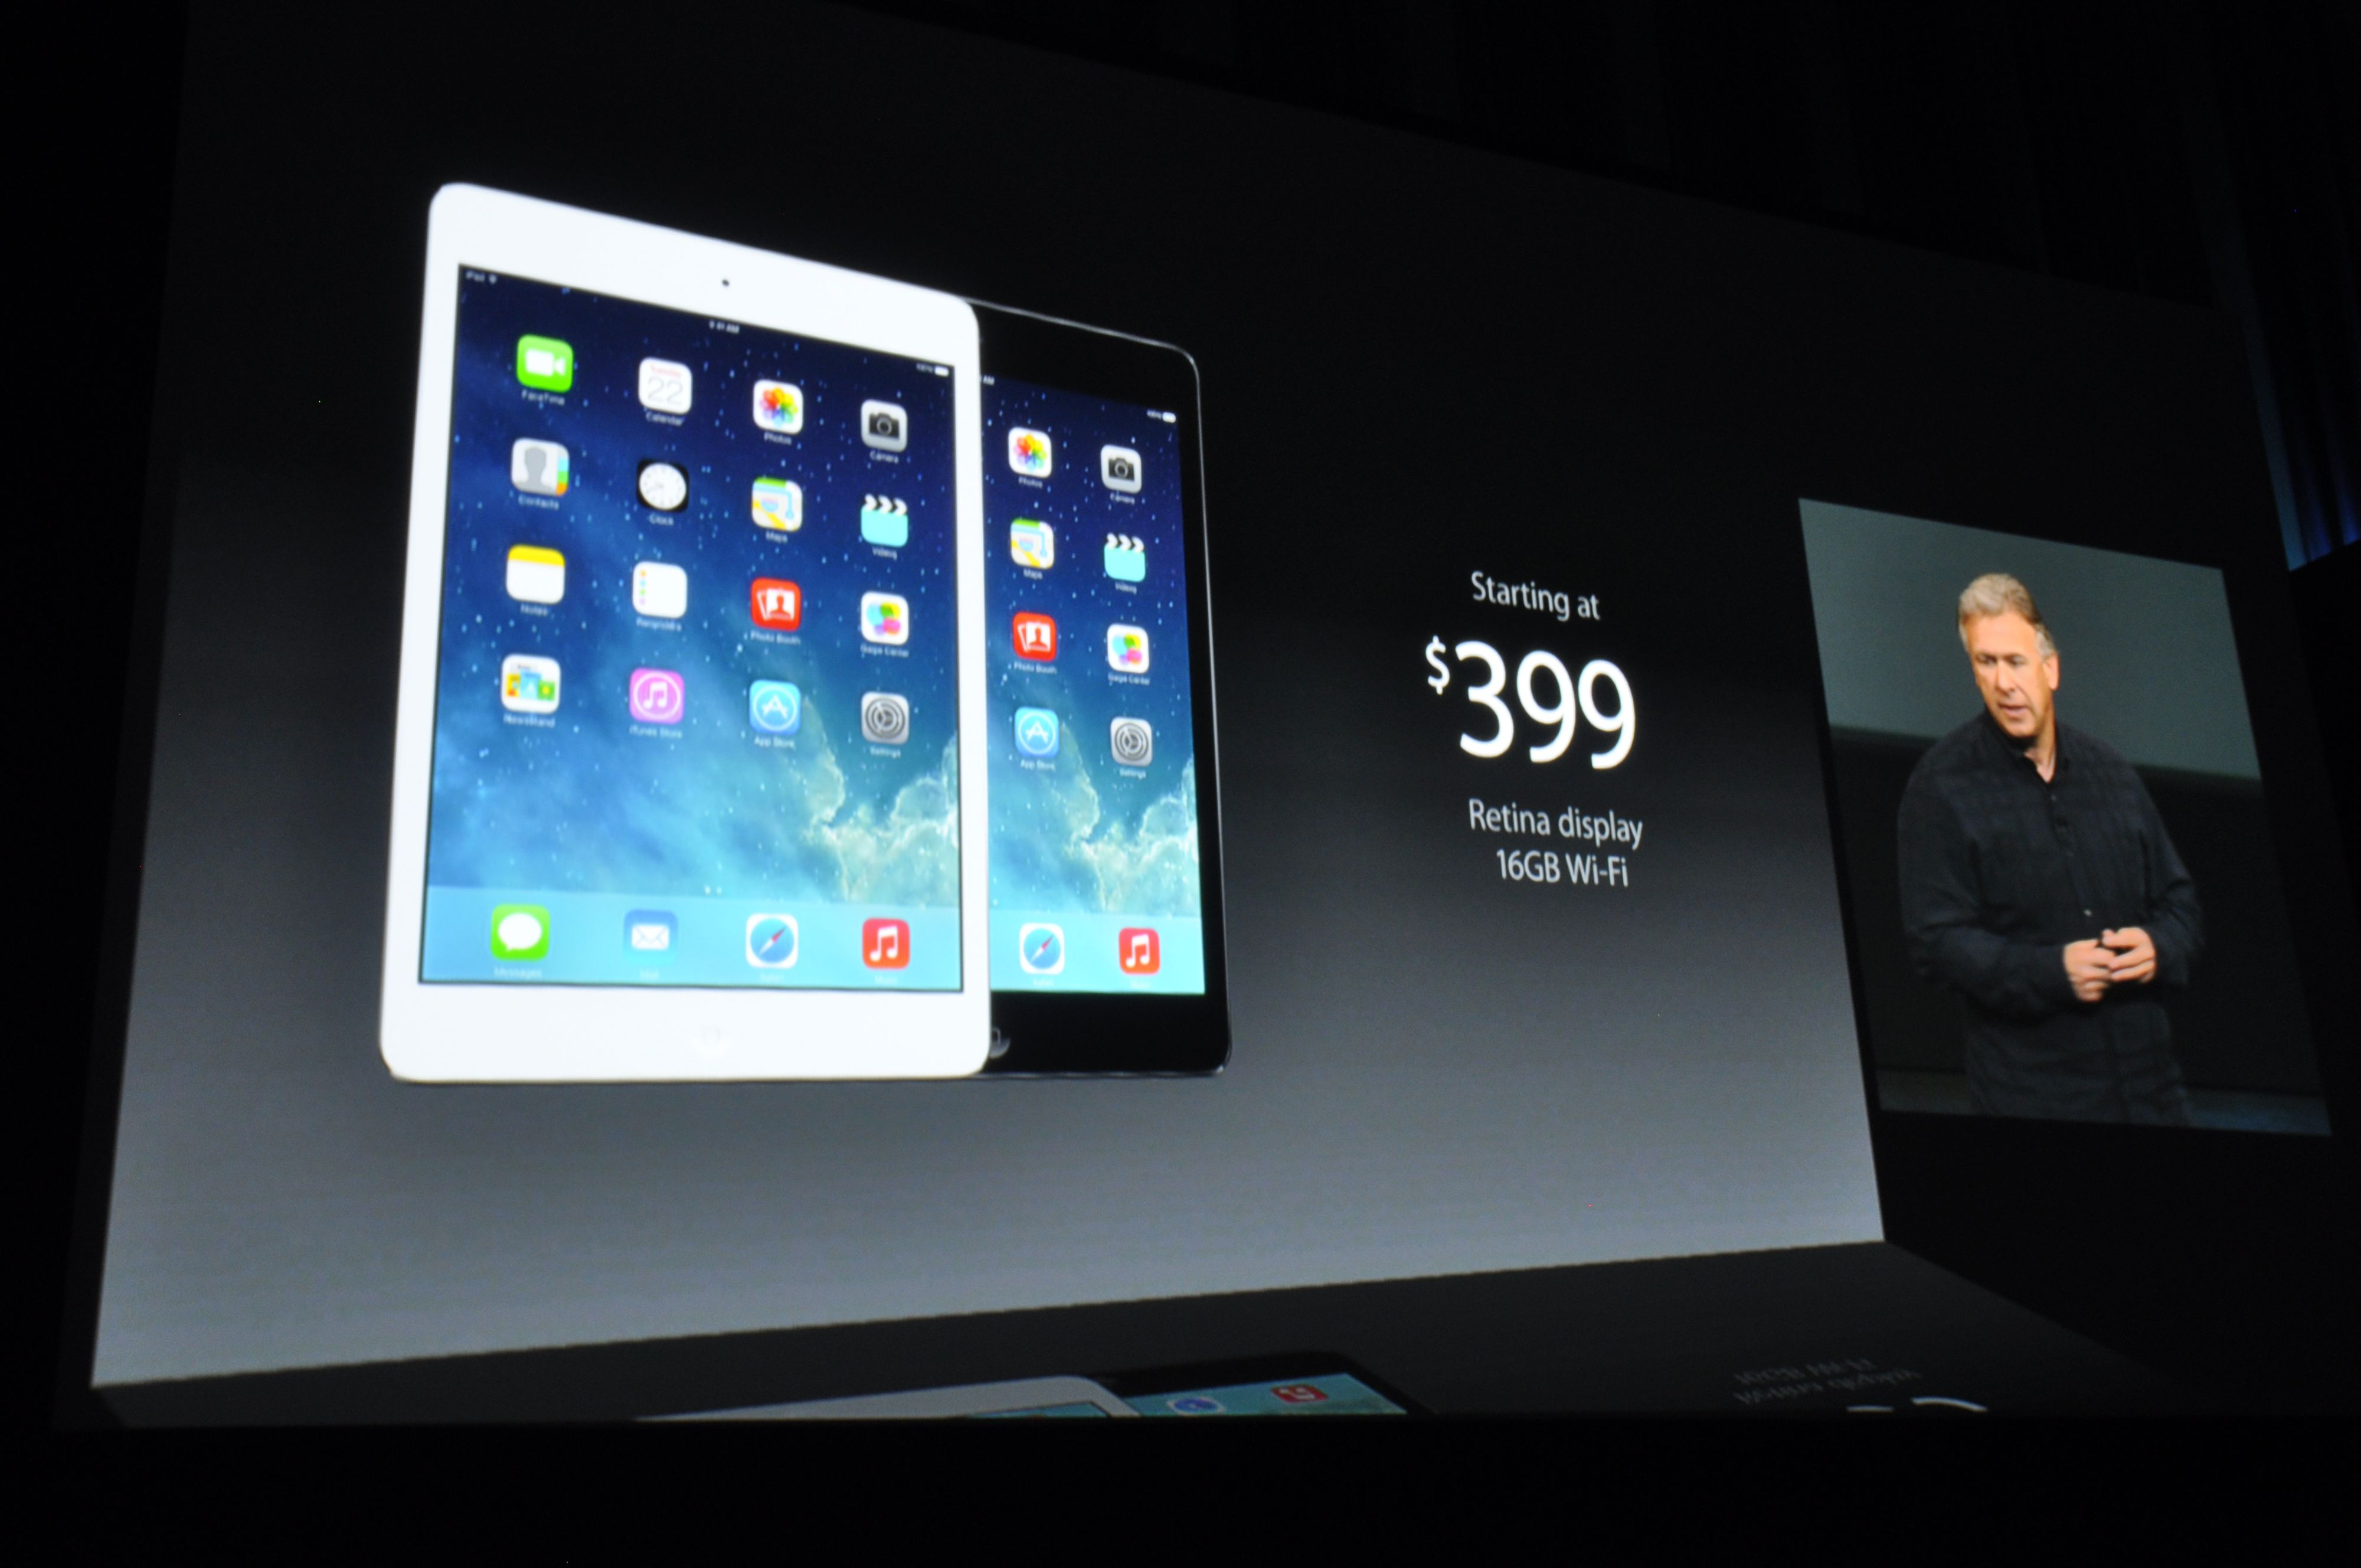 iPad Mini med Retina-skjerm er lansert.Foto: Finn Jarle Kvalheim, Amobil.no